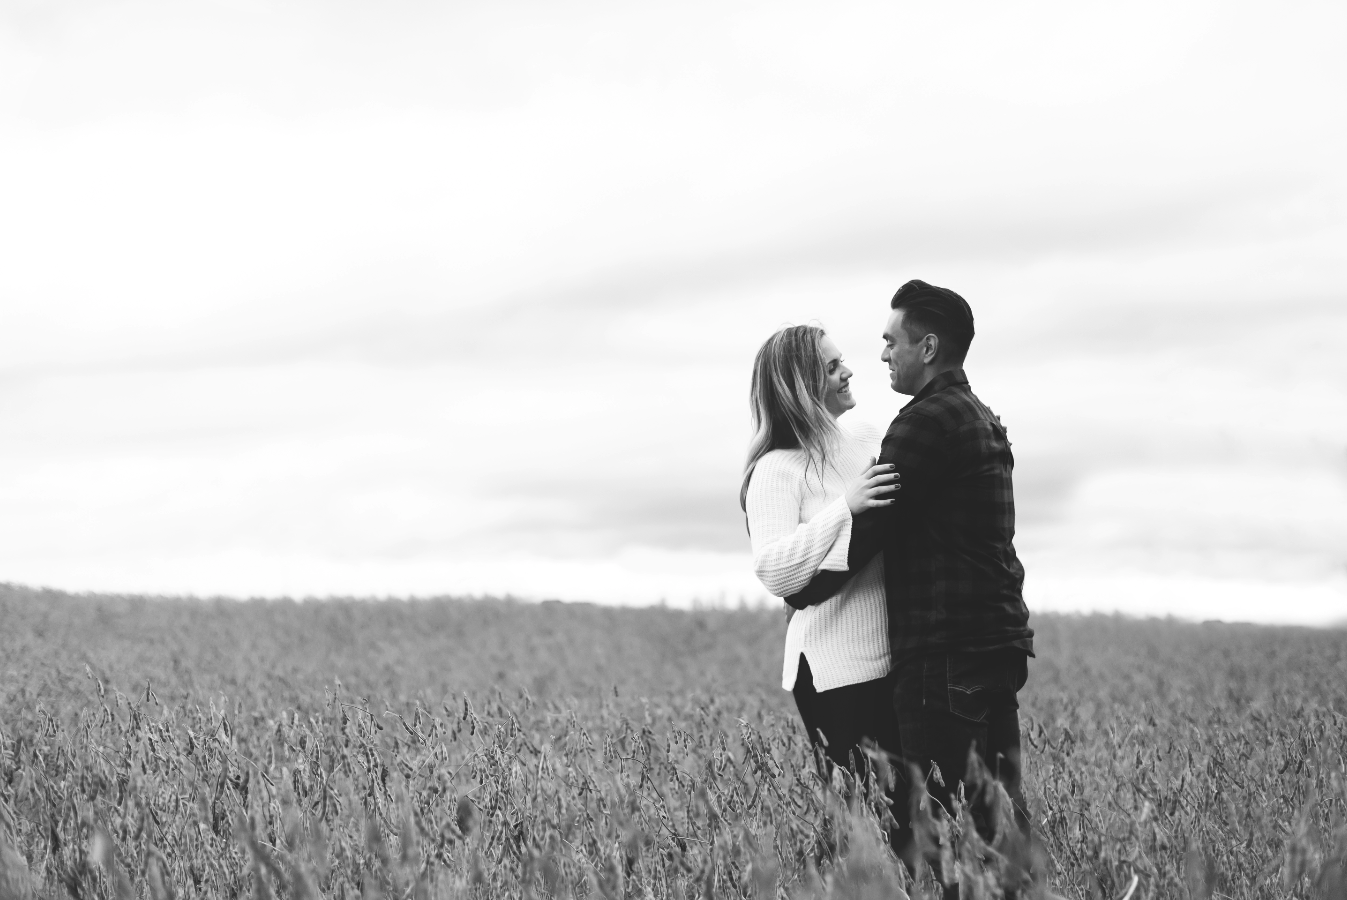 Engagement-Photography-Bruce-Trail-Rain-Hamilton-Burlington-Oakville-Niagara-Toronto-Wedding-Photographer-Photo-Image-20.png